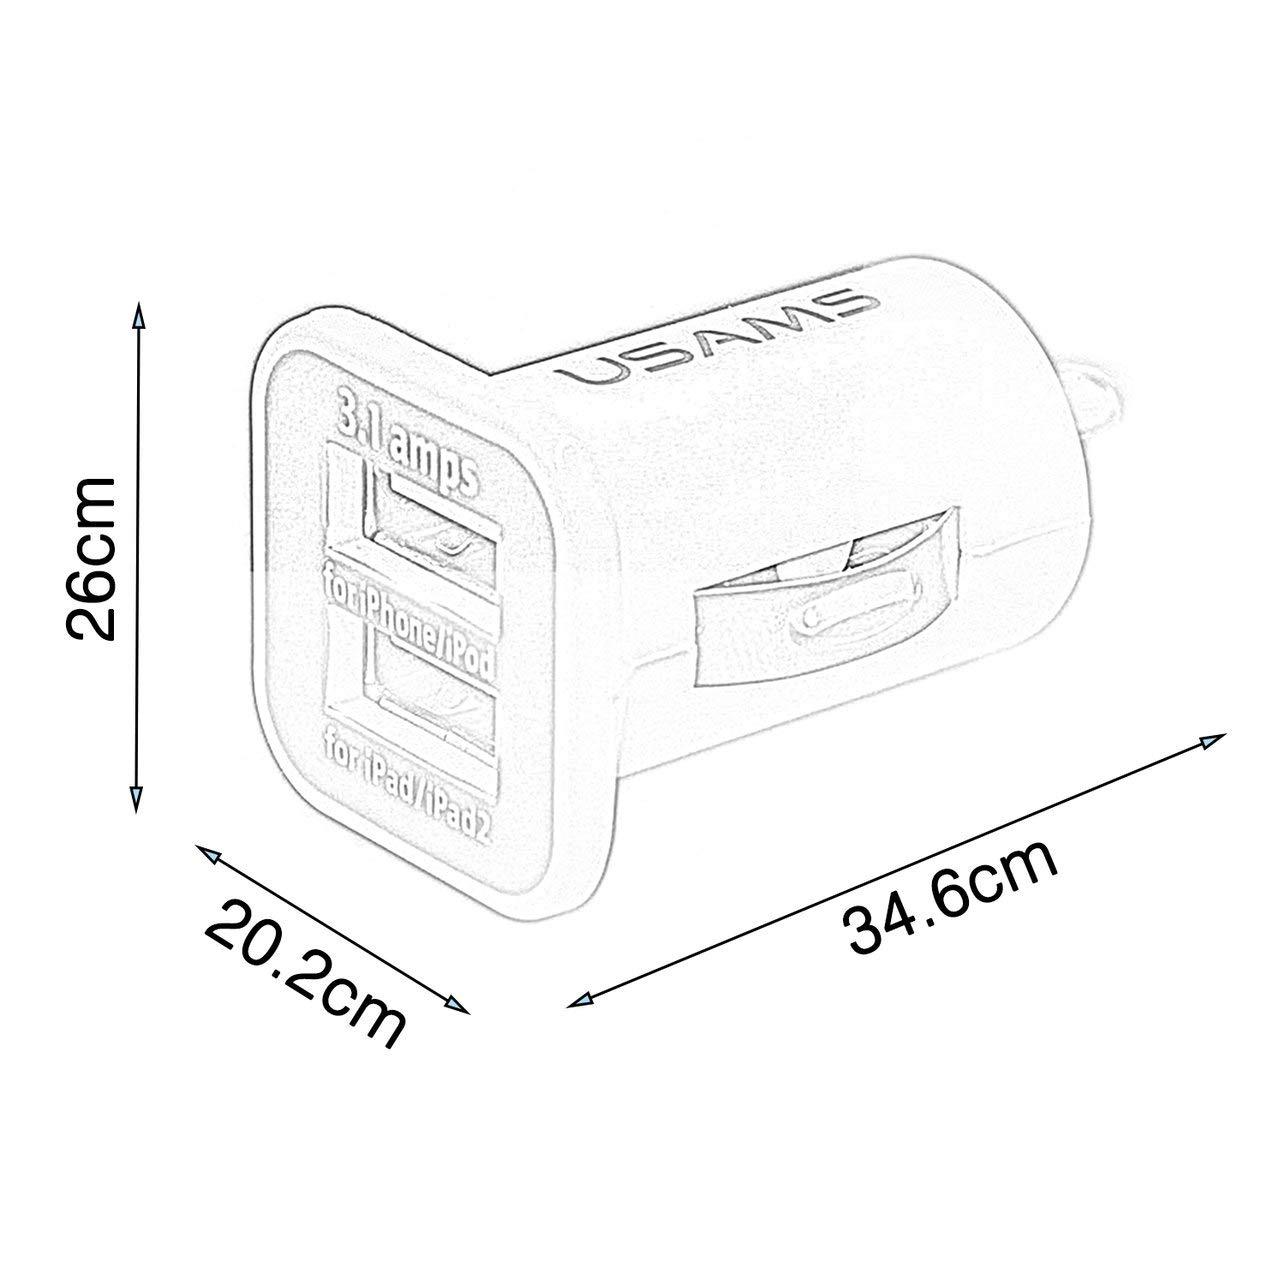 WOSOSYEYO USAMS Universal 12V 3.1A Mini port/átil Dual Puertos USB veh/ículos de Alquiler de Cargador para el tel/éfono m/óvil Tablet PC Dispositivos